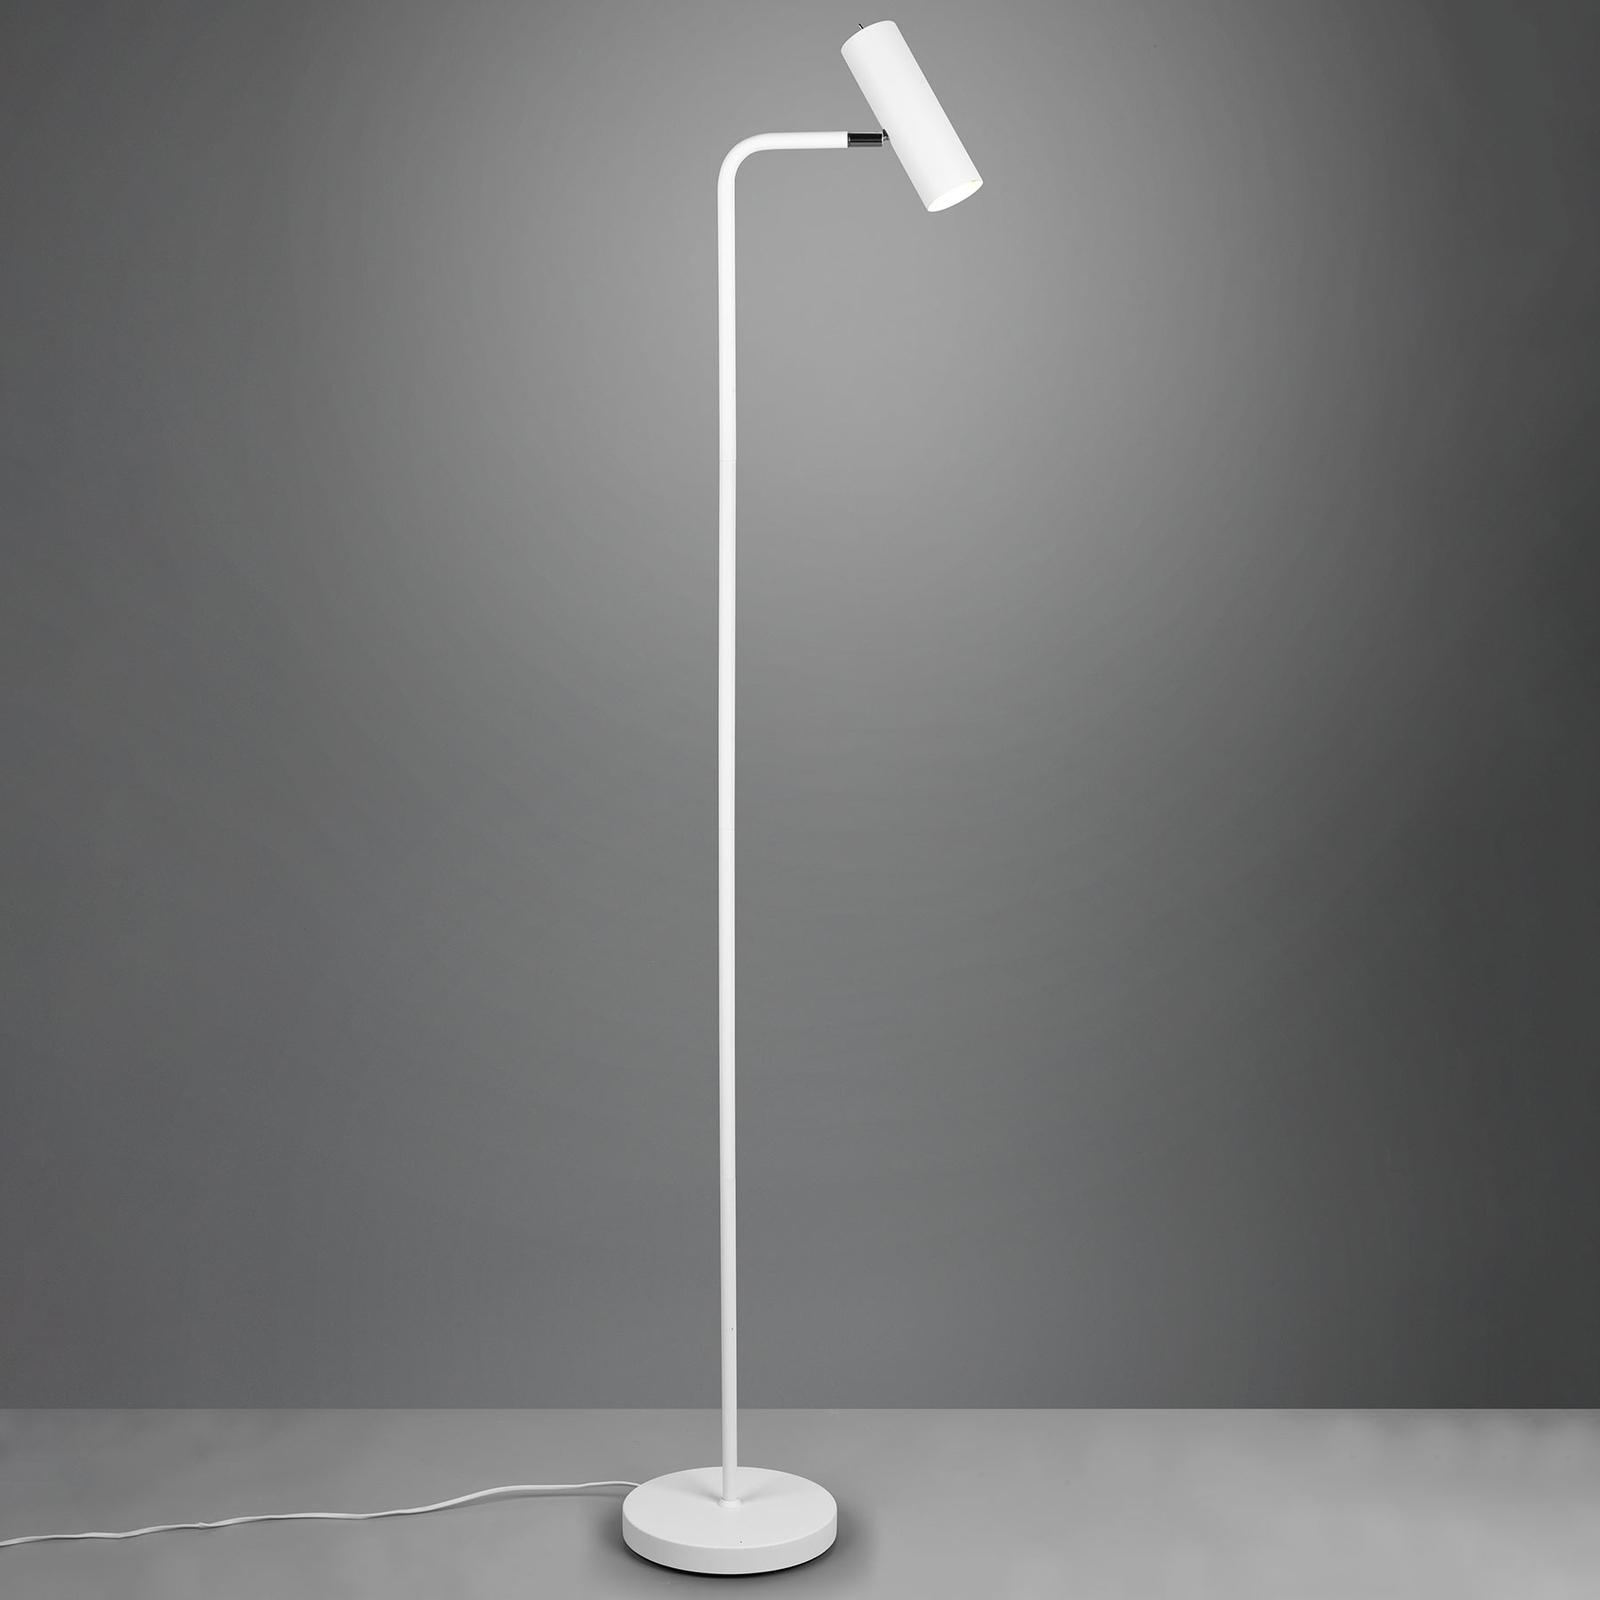 Stojací lampa Marley, bílá matná